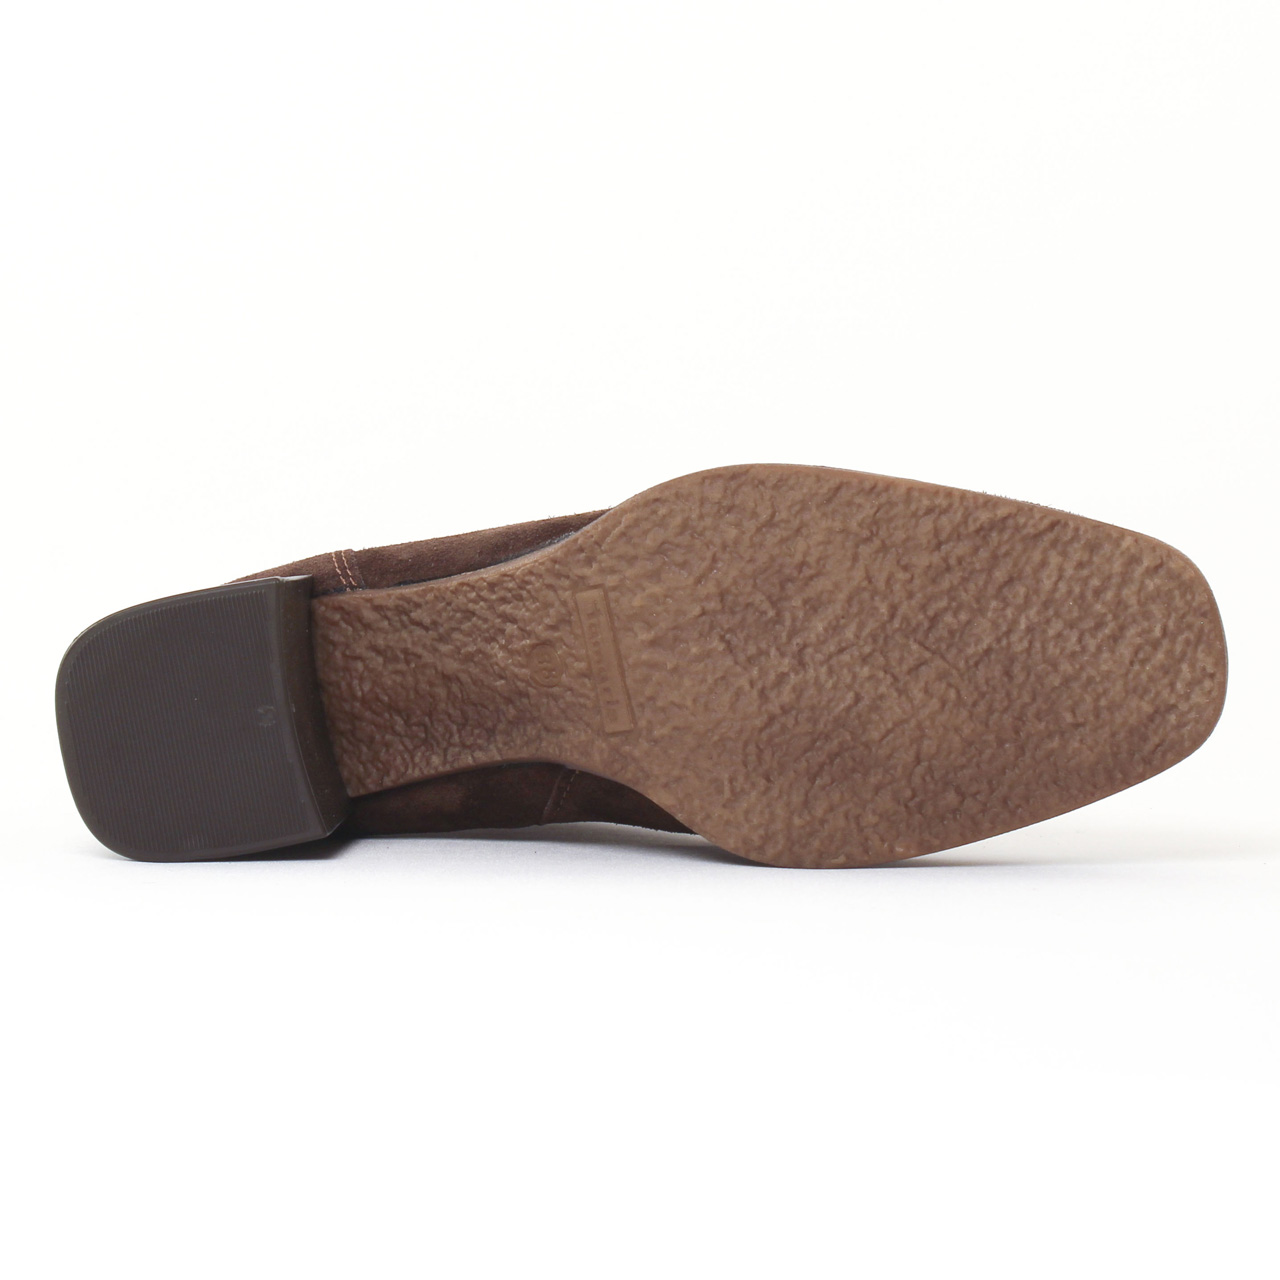 Tamaris 25478 Chocolat | boot talon marron automne hiver